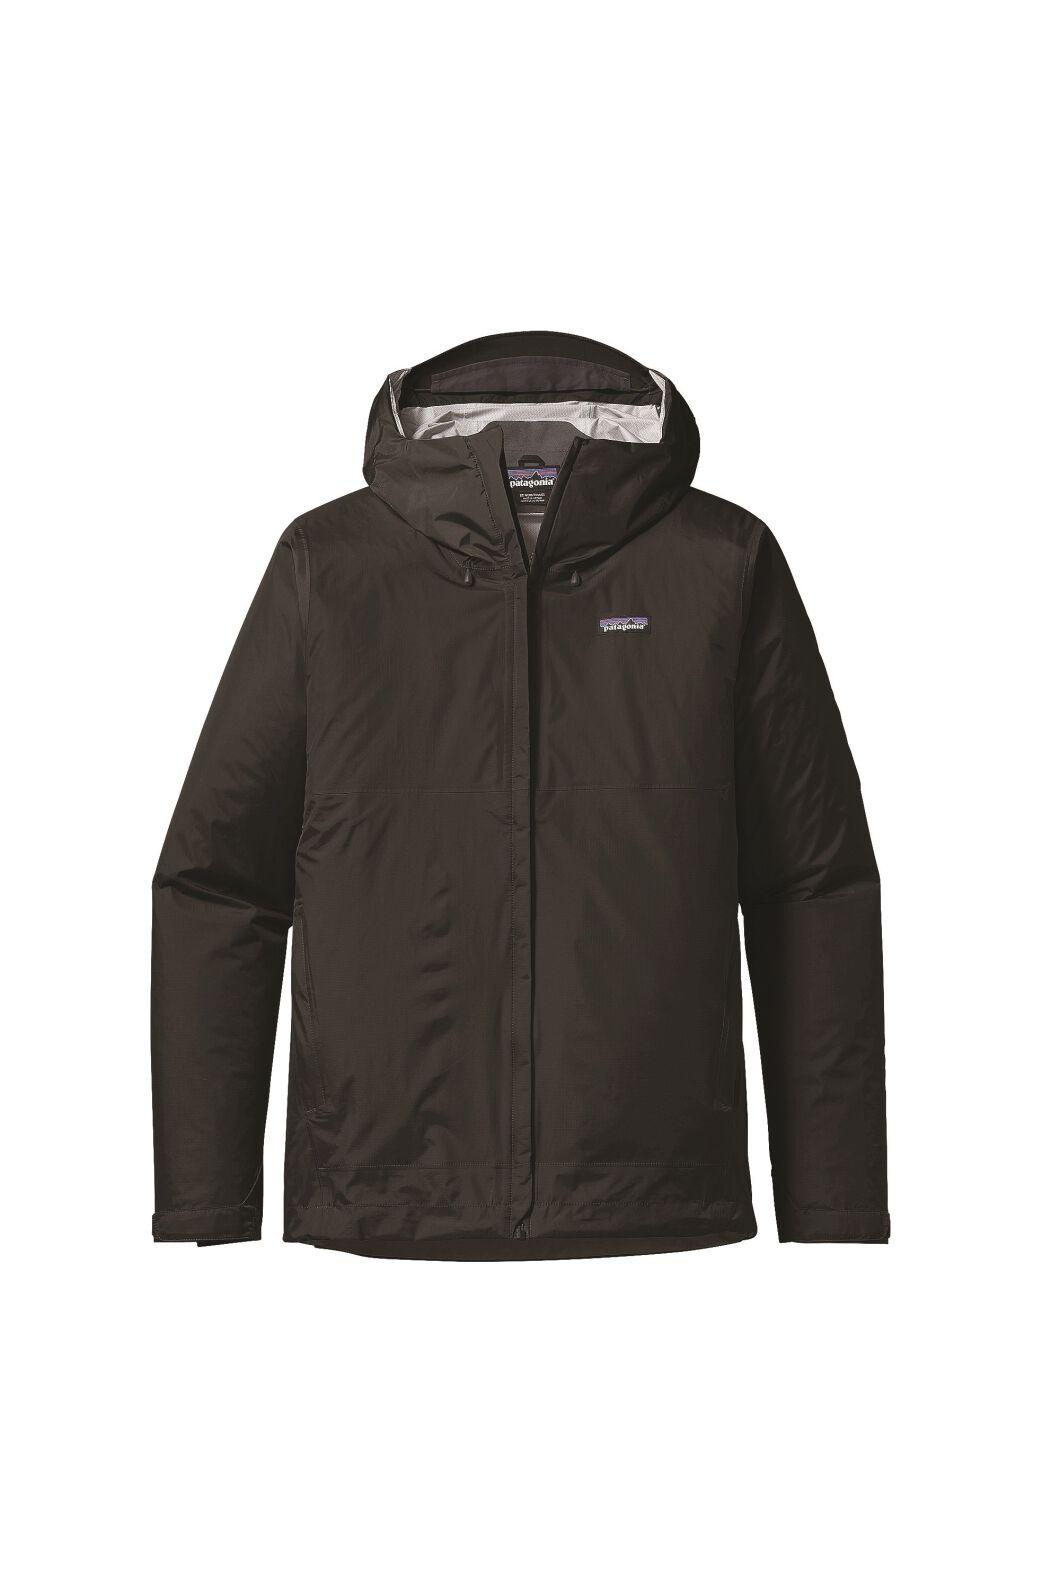 Patagonia Men's Torrentshell Jacket, Black, hi-res